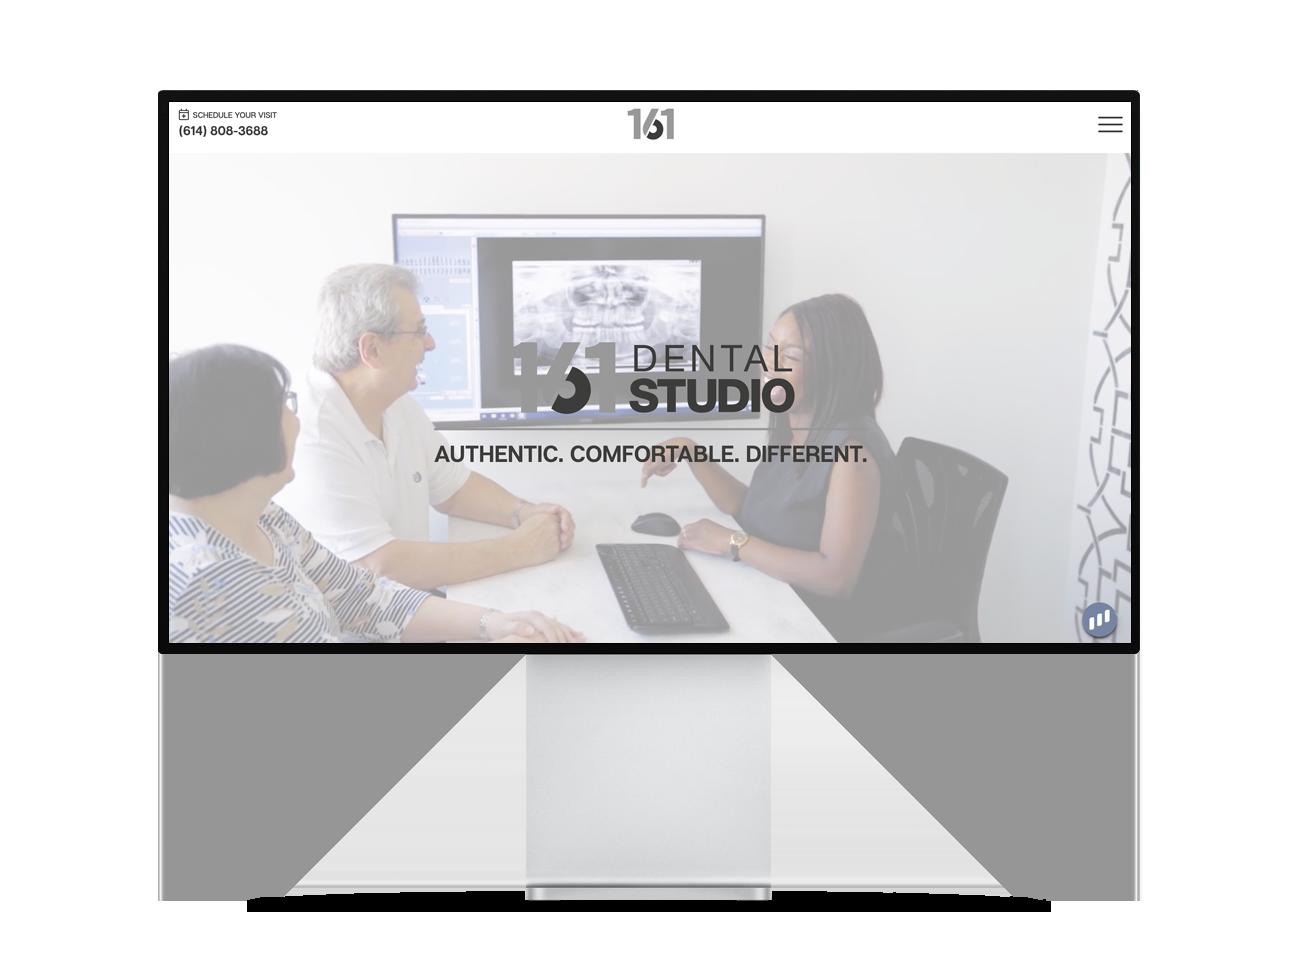 Screenshot of the 161 Dental Studio homepage